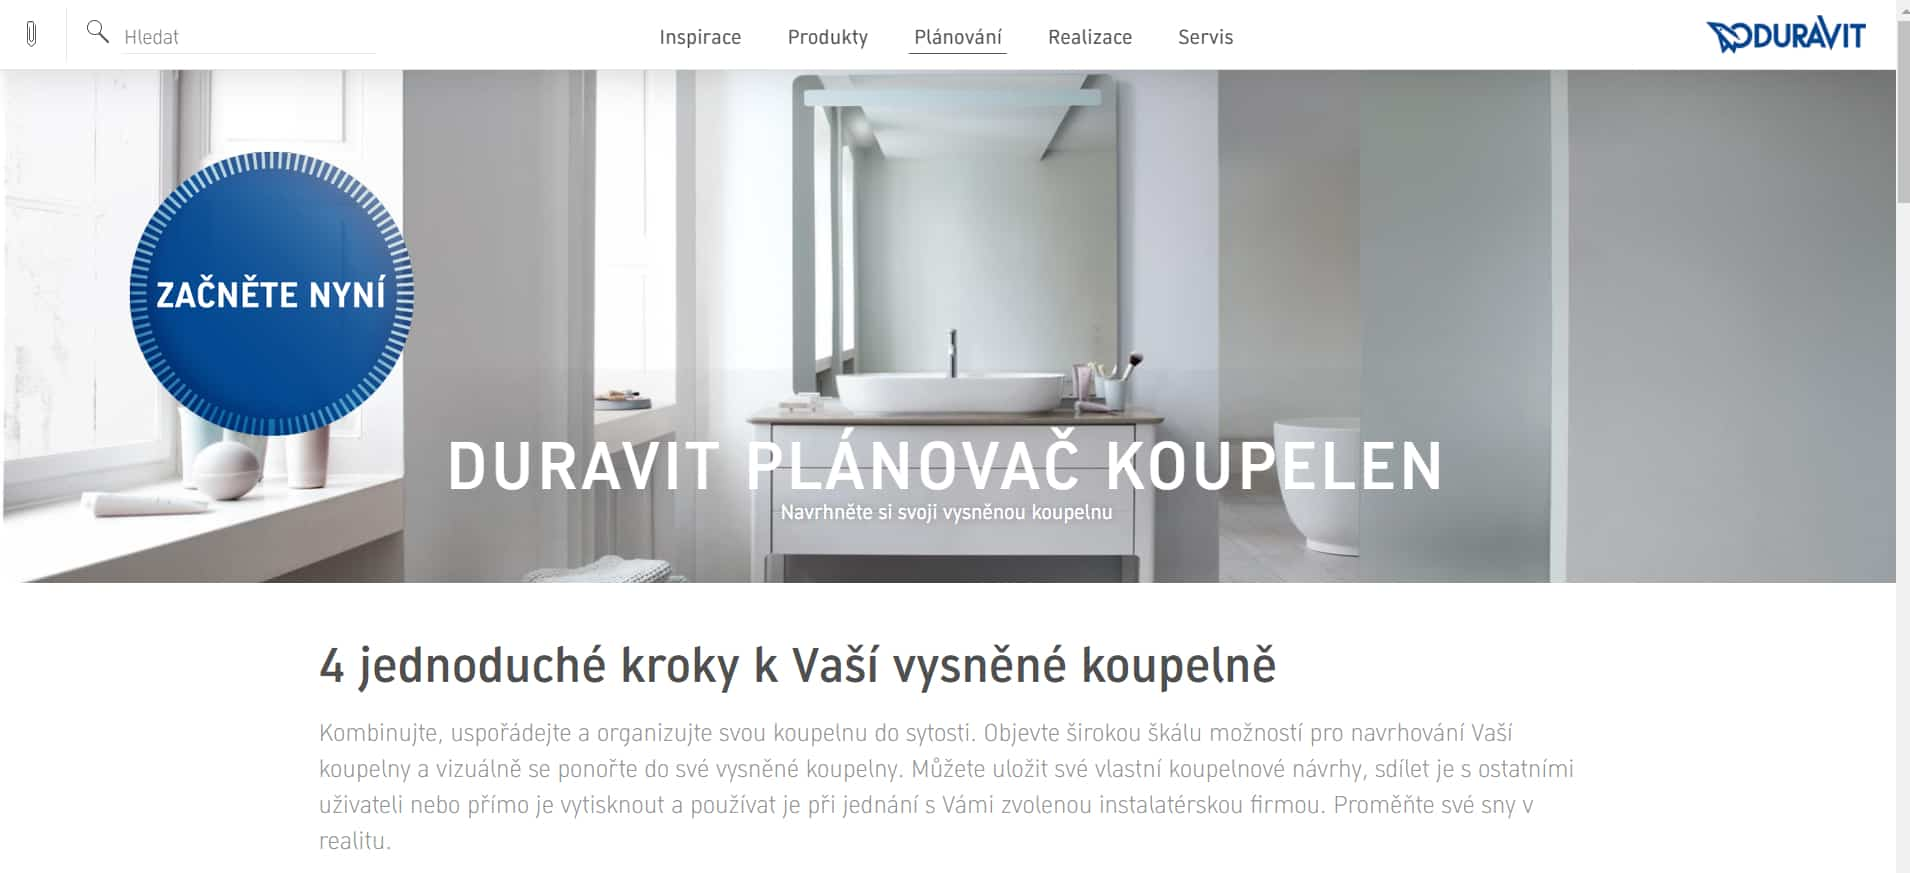 Duravit plánovač koupelen online - recenze